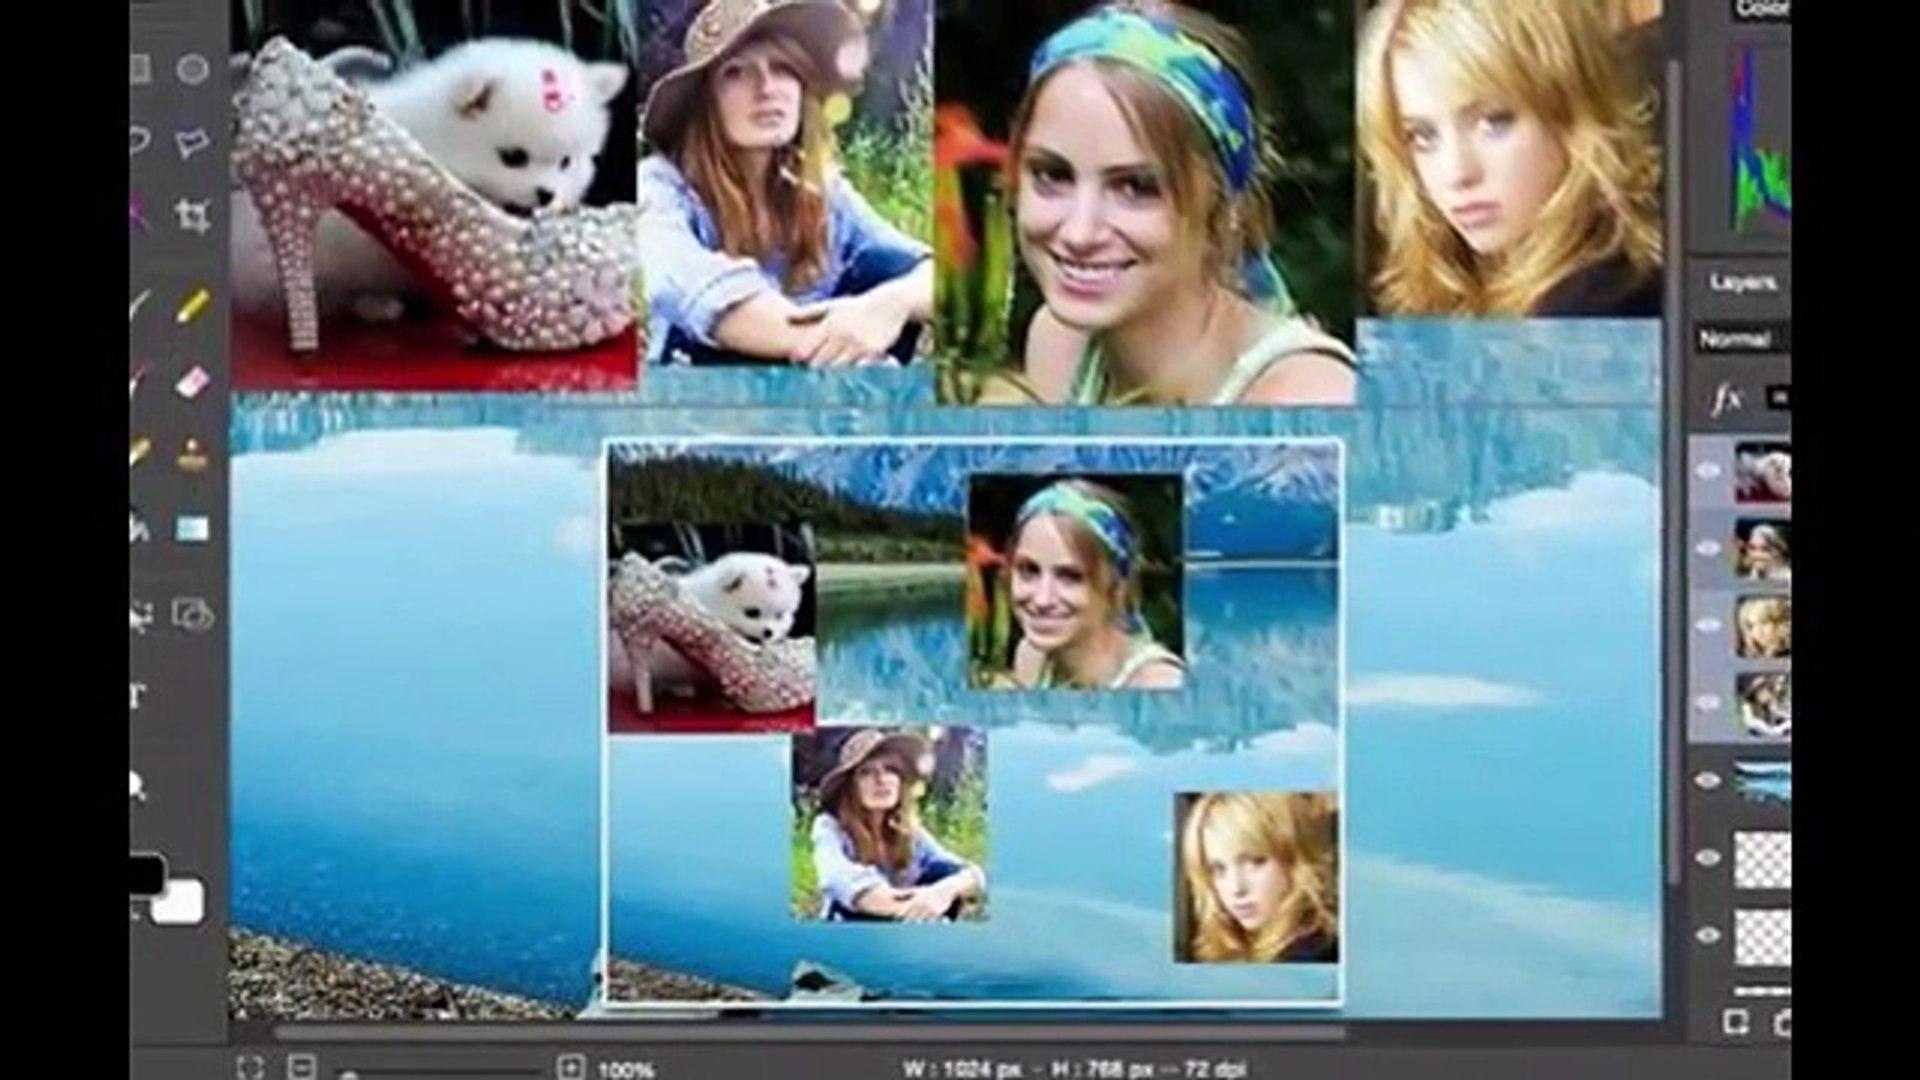 PixelStyle Photo Editor for Mac -- effectmatrix.com-mac-appstore-mac-photo-editor-pixelstyle.htm